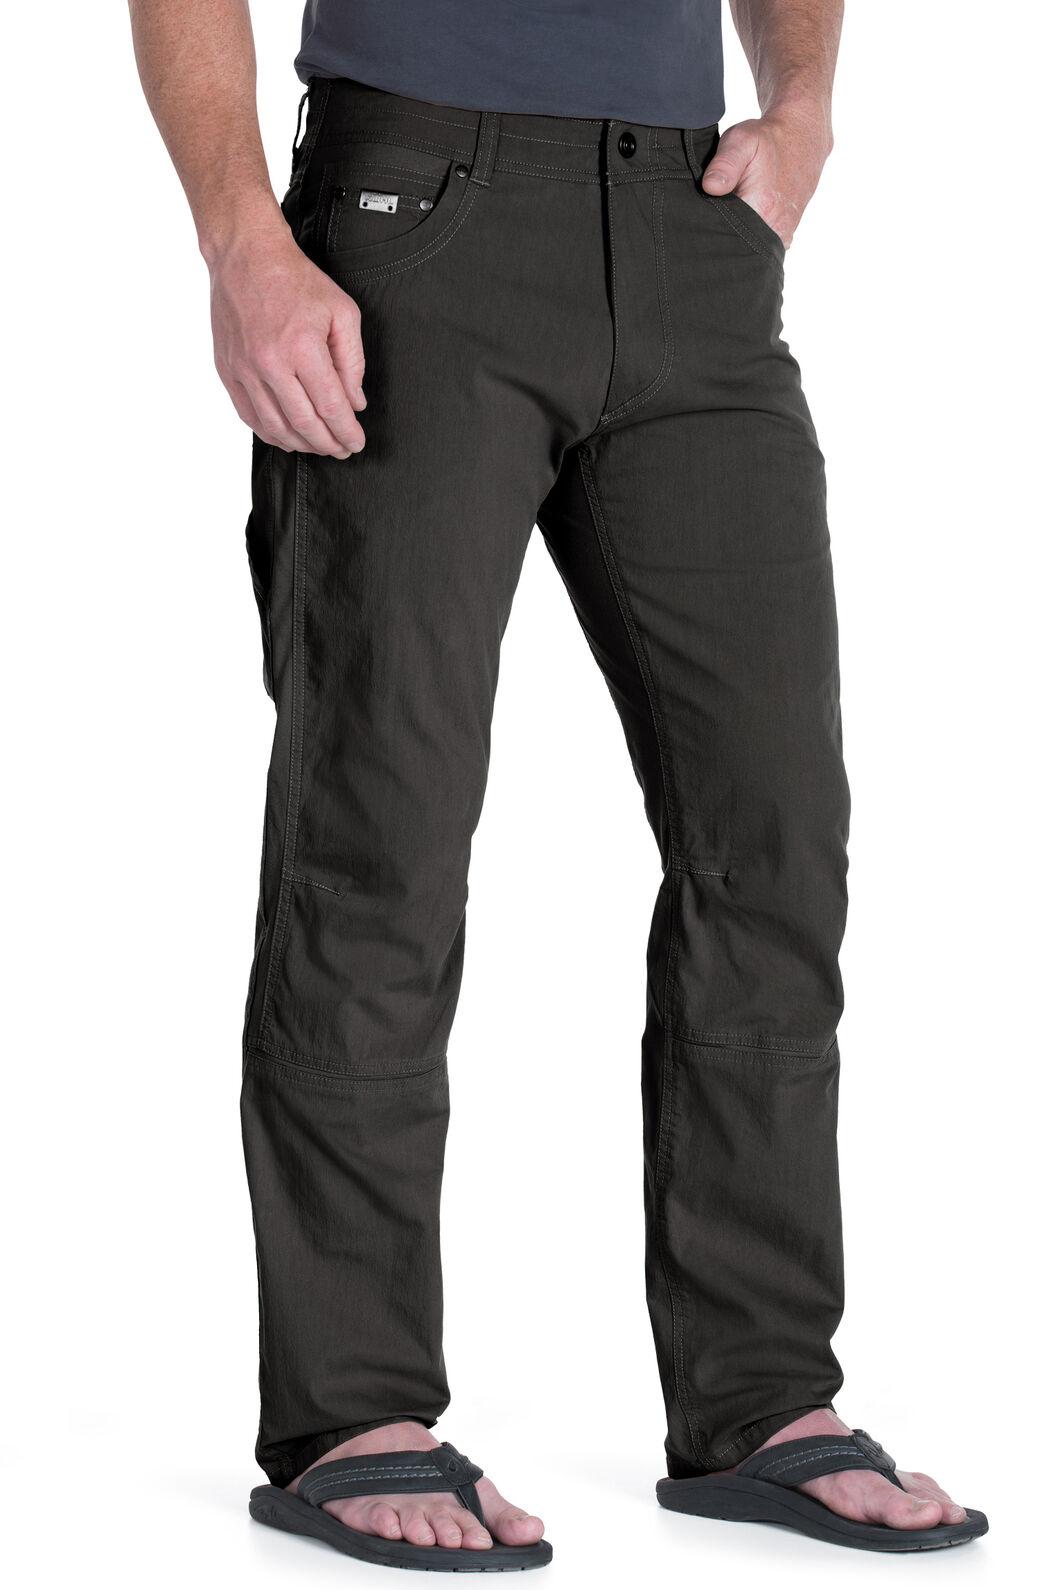 Kuhl Radikl Pants (34 inch) - Men's, Carbon, hi-res